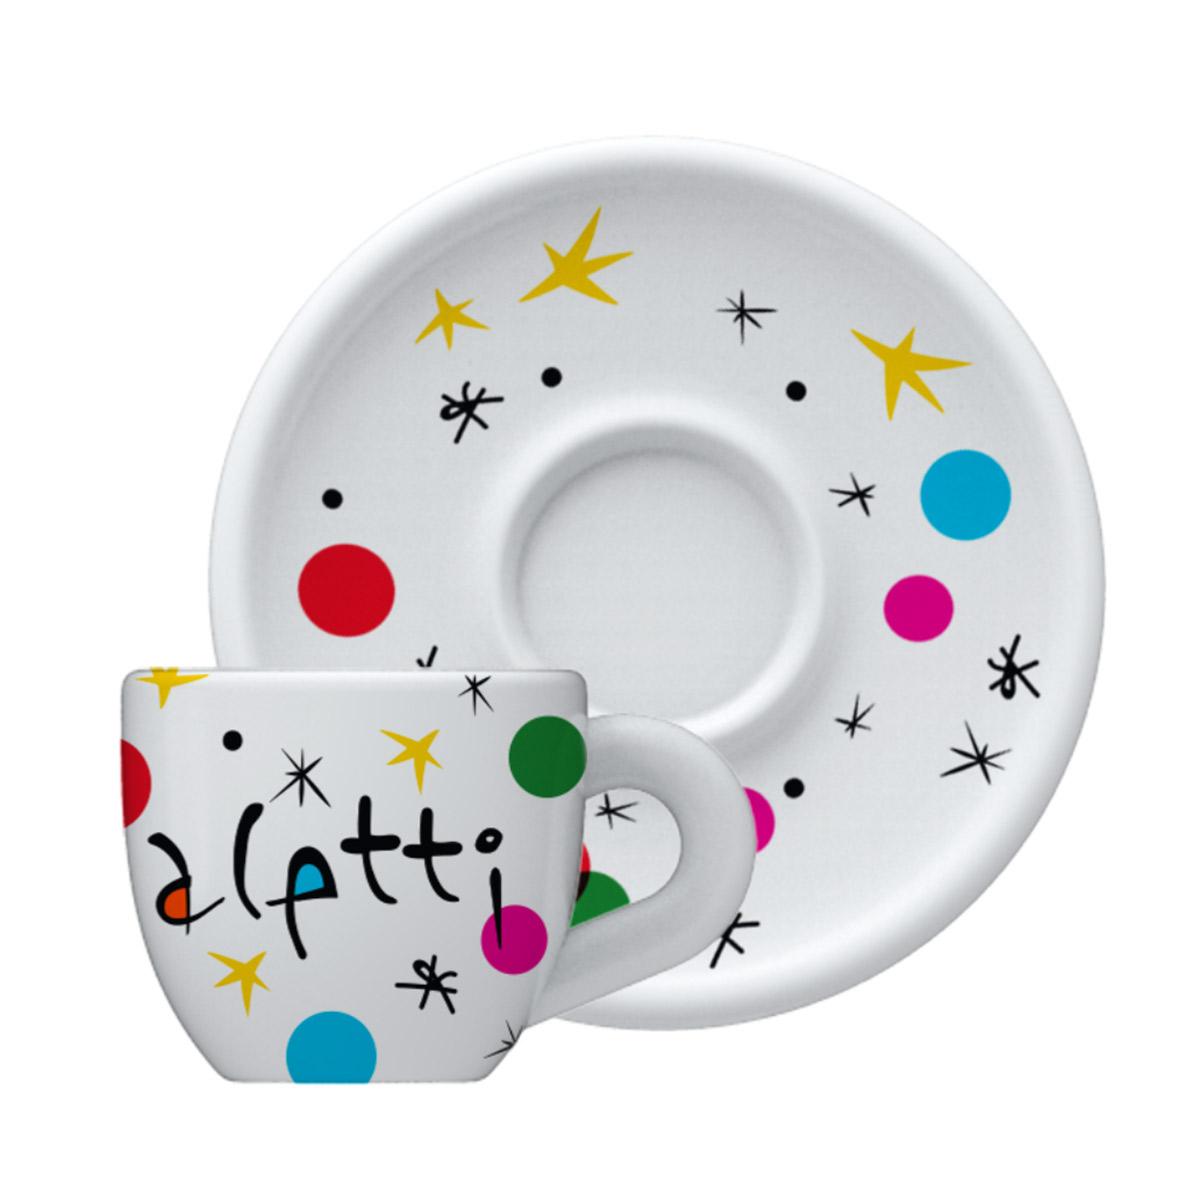 Taza para Cappuccino Miro de Porcelana Bialetti Diseño Personalizado